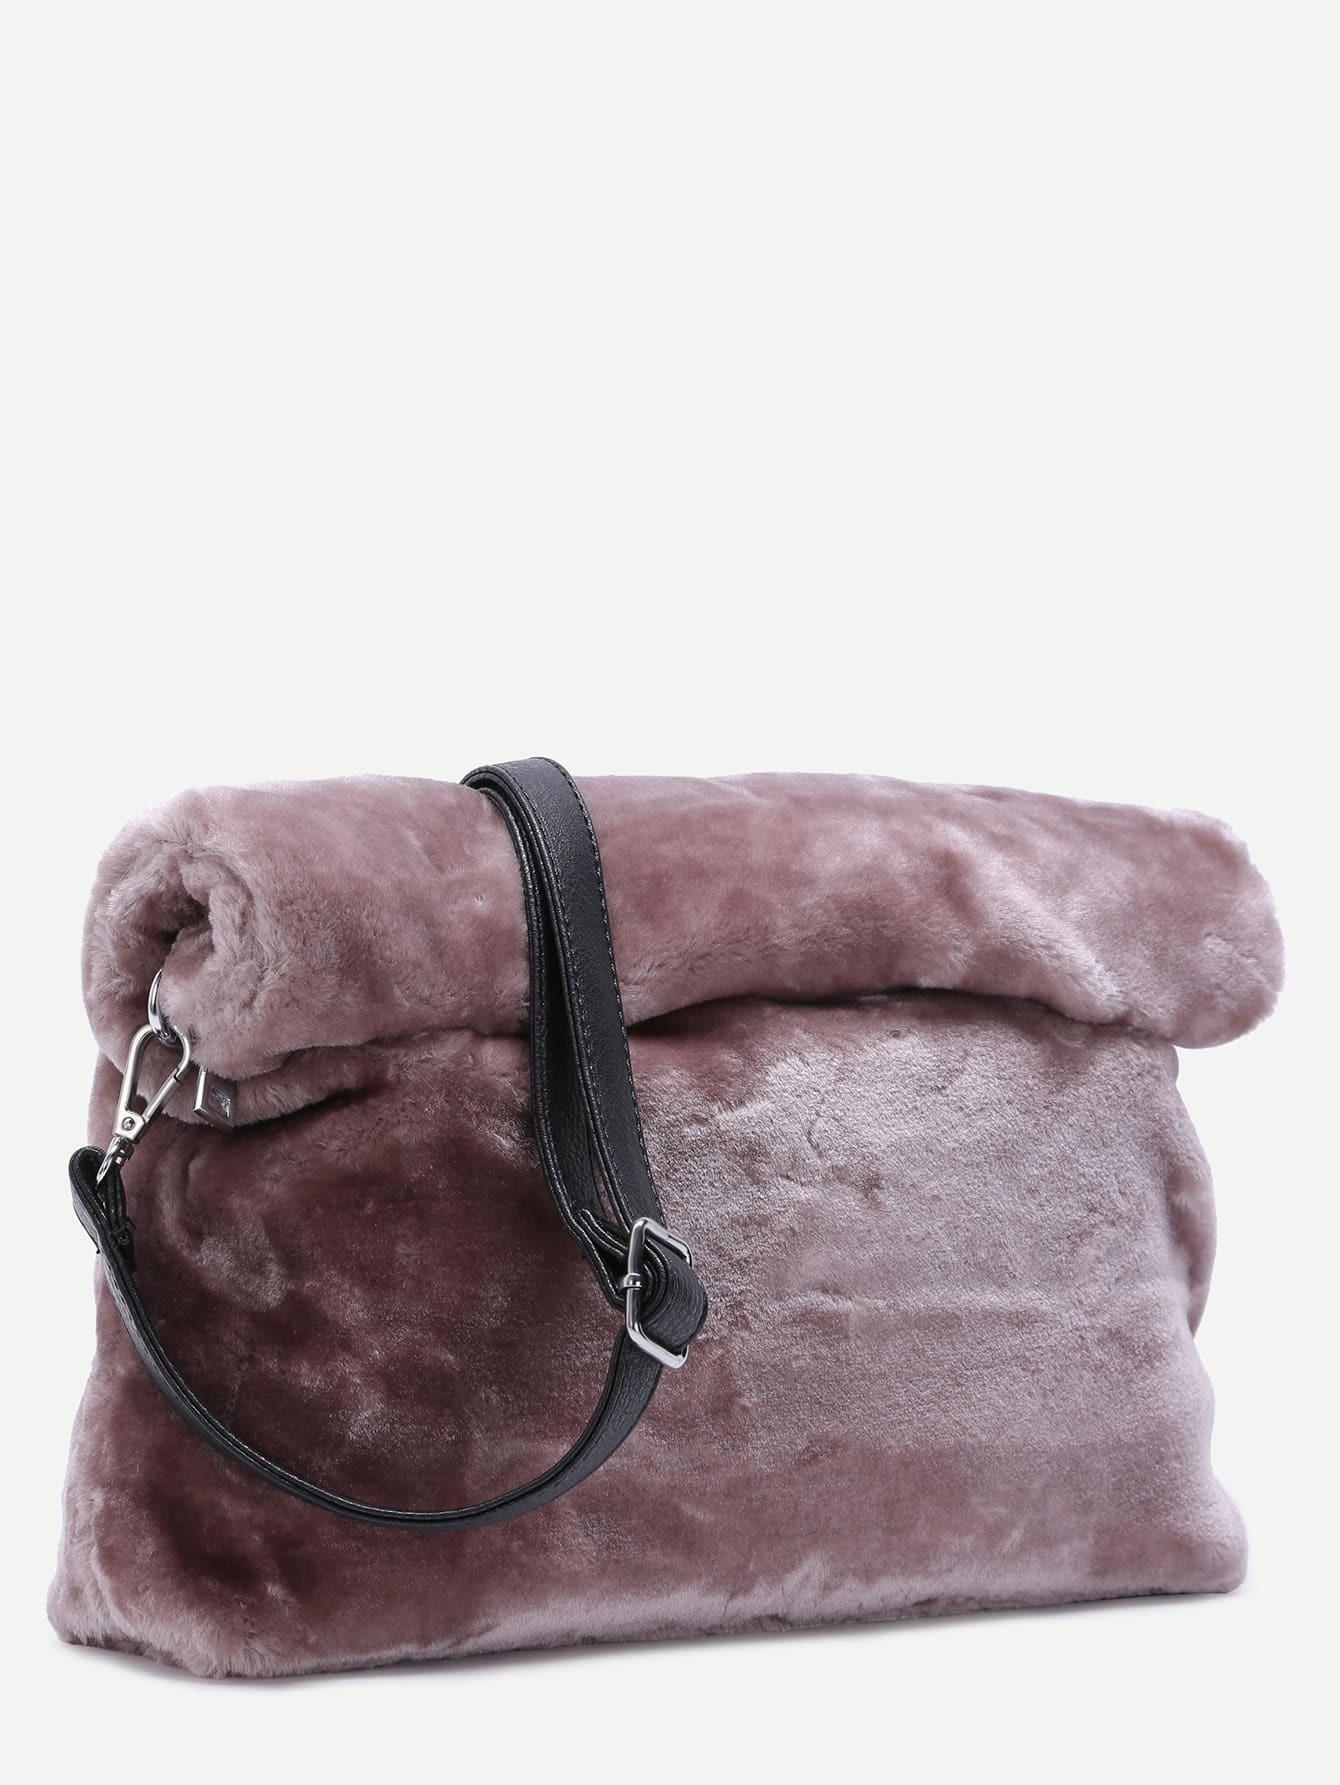 verschluss crossbody tasche mit rei verschluss kunstpelz rosa german shein sheinside. Black Bedroom Furniture Sets. Home Design Ideas